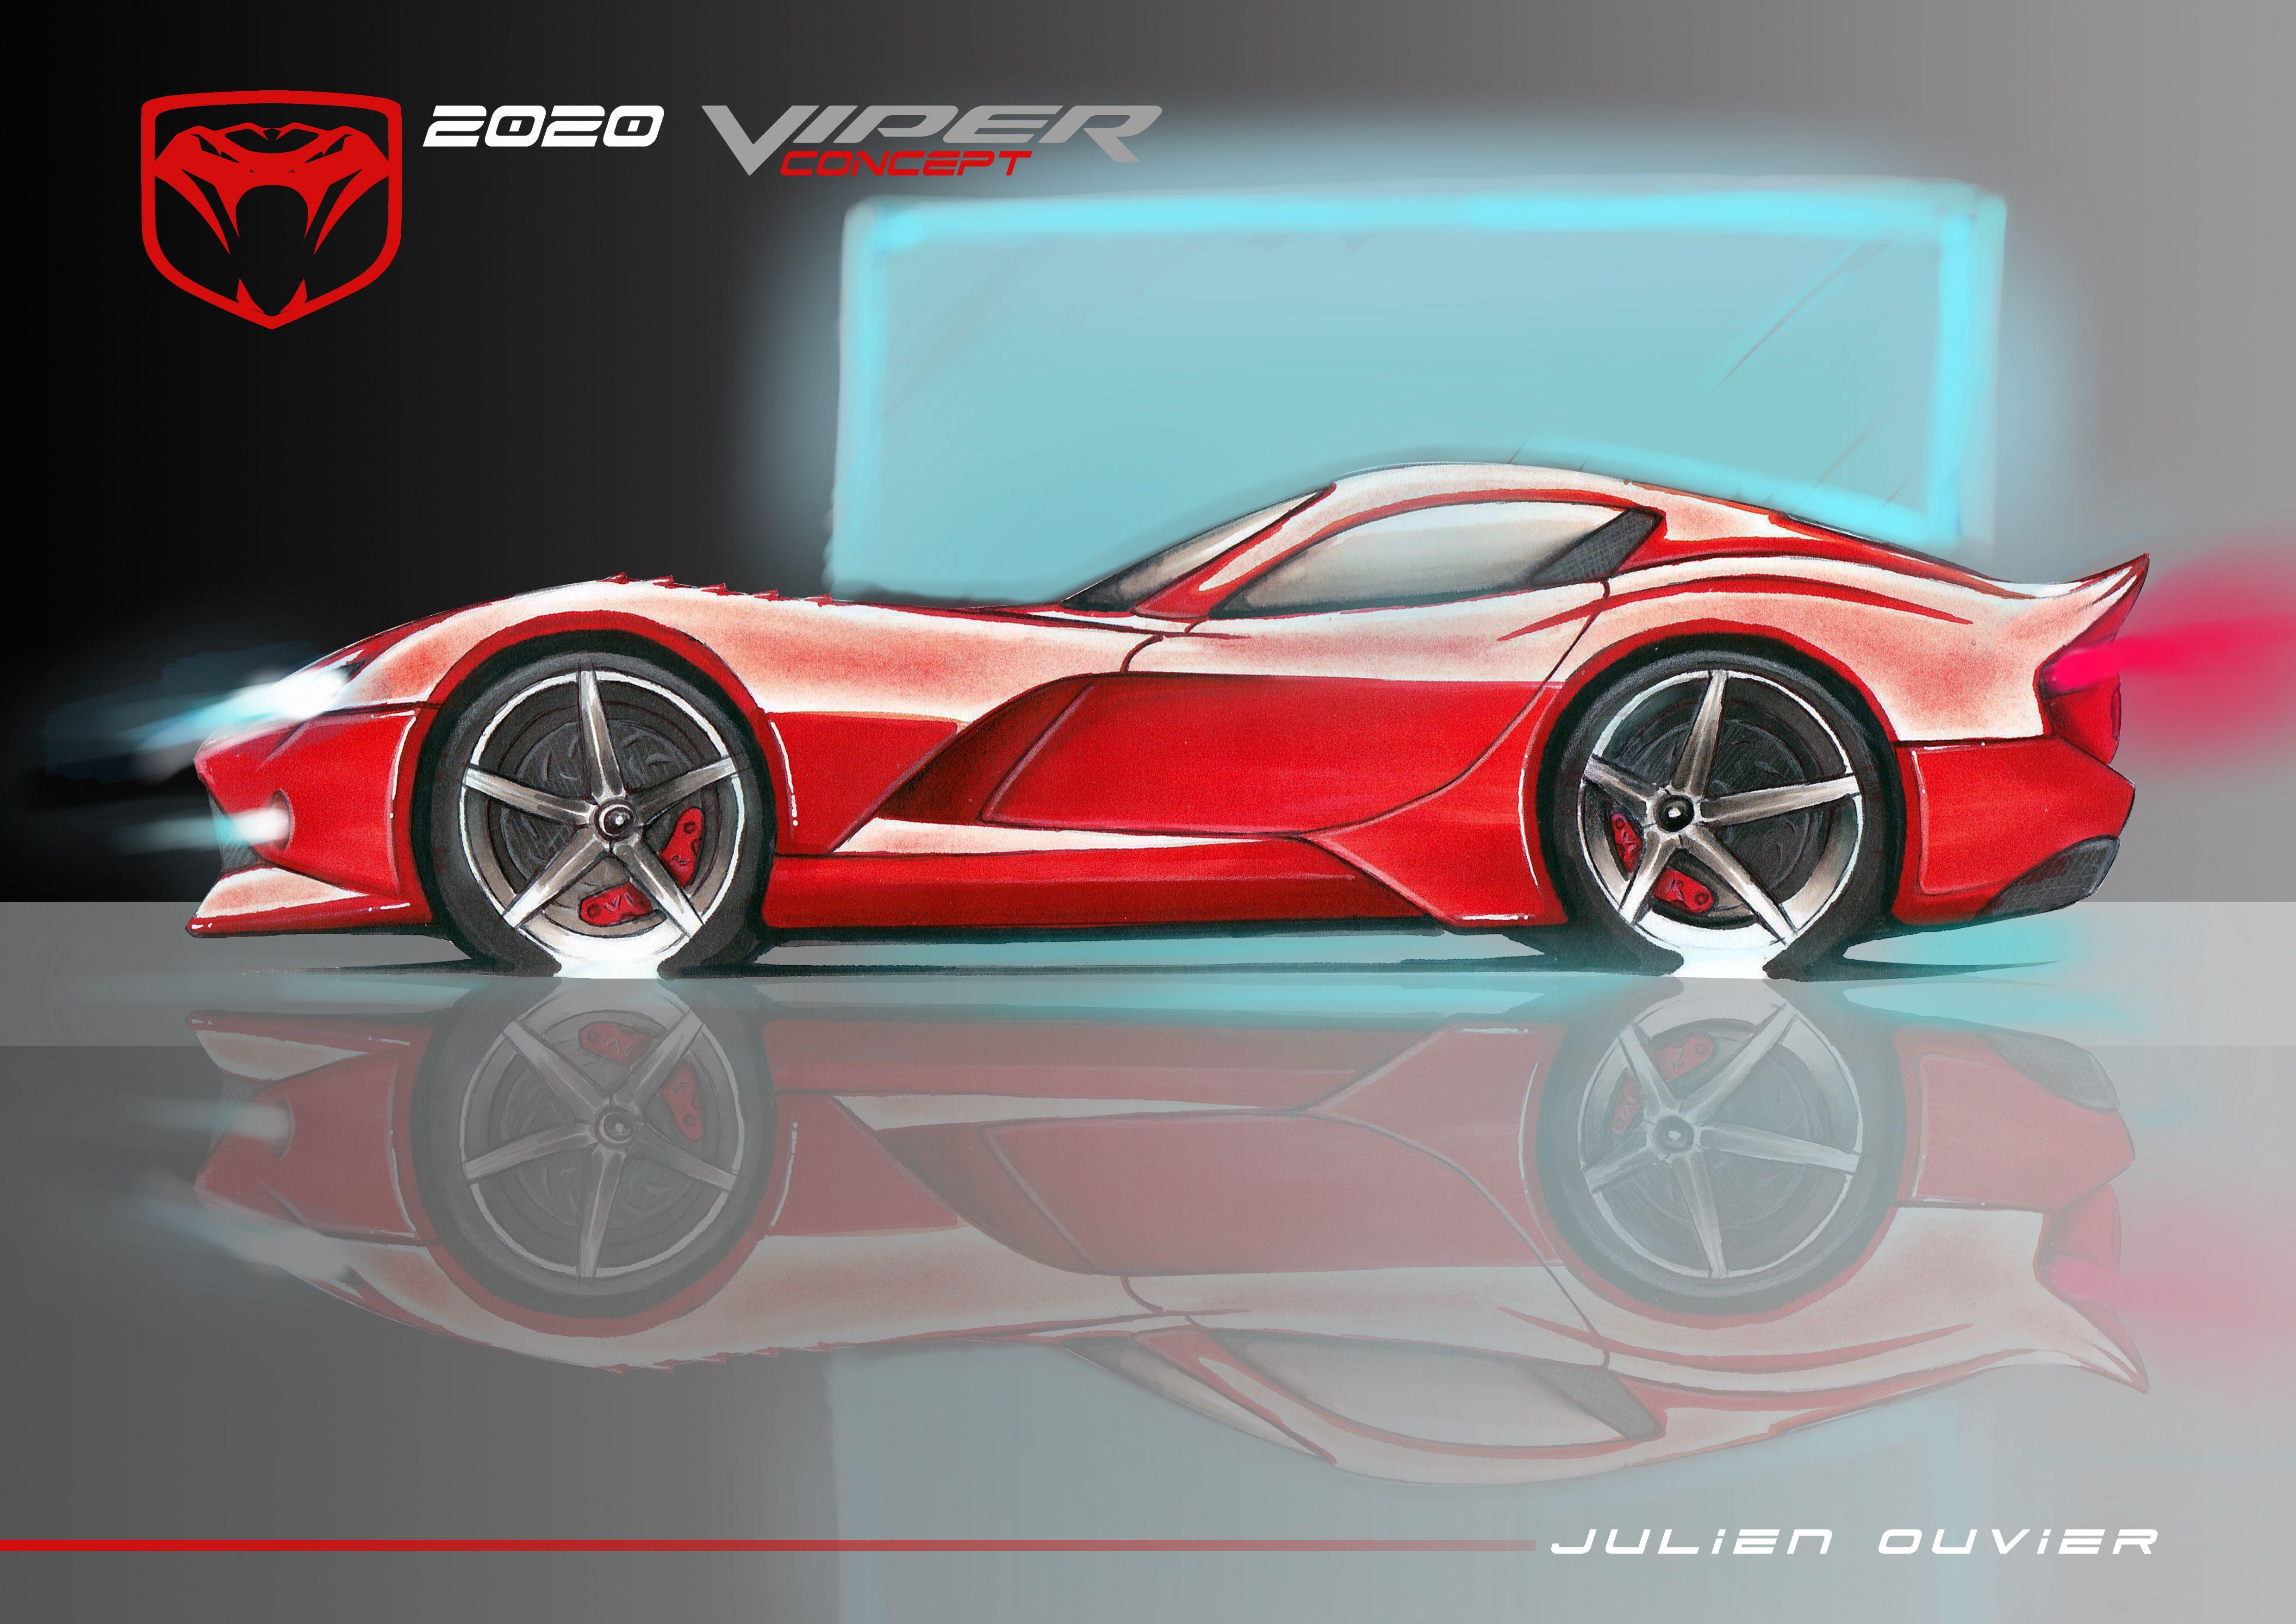 2020 Viper Concept Sketch By Julien Ouvier Copyrights Julien Ouvier Dodge Viper Dodge Viper Gts Viper Acr